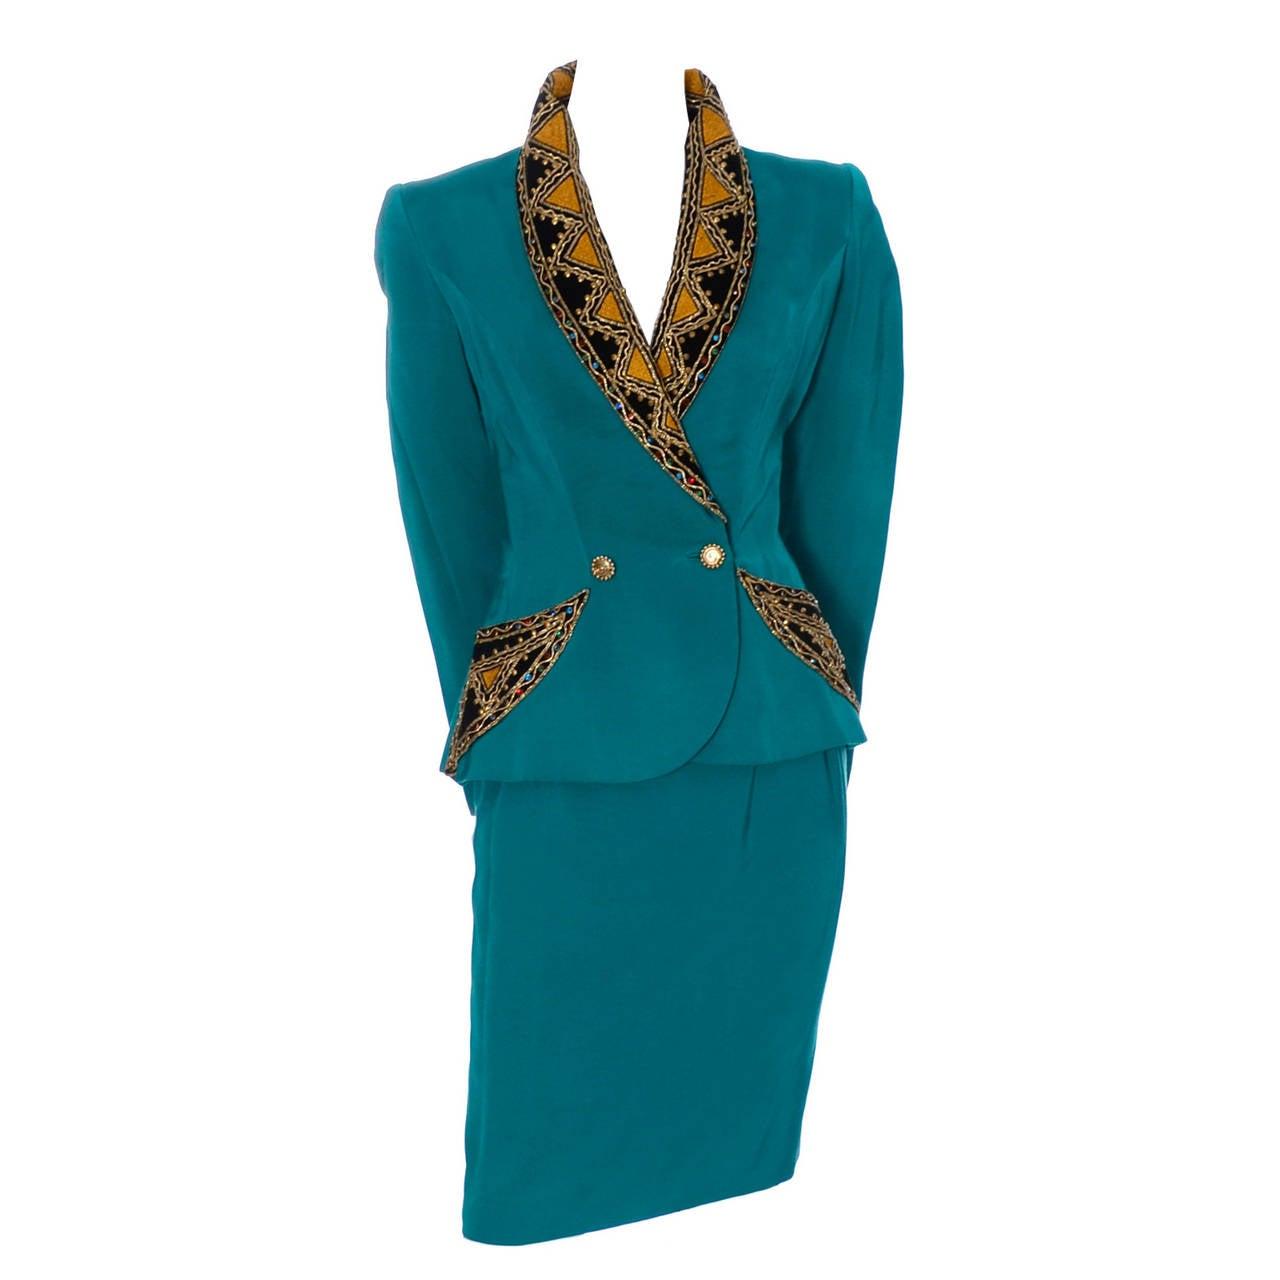 1980s Bob Mackie Vintage Metallic Embroidery Skirt Suit w/ Rhinestones & Studs